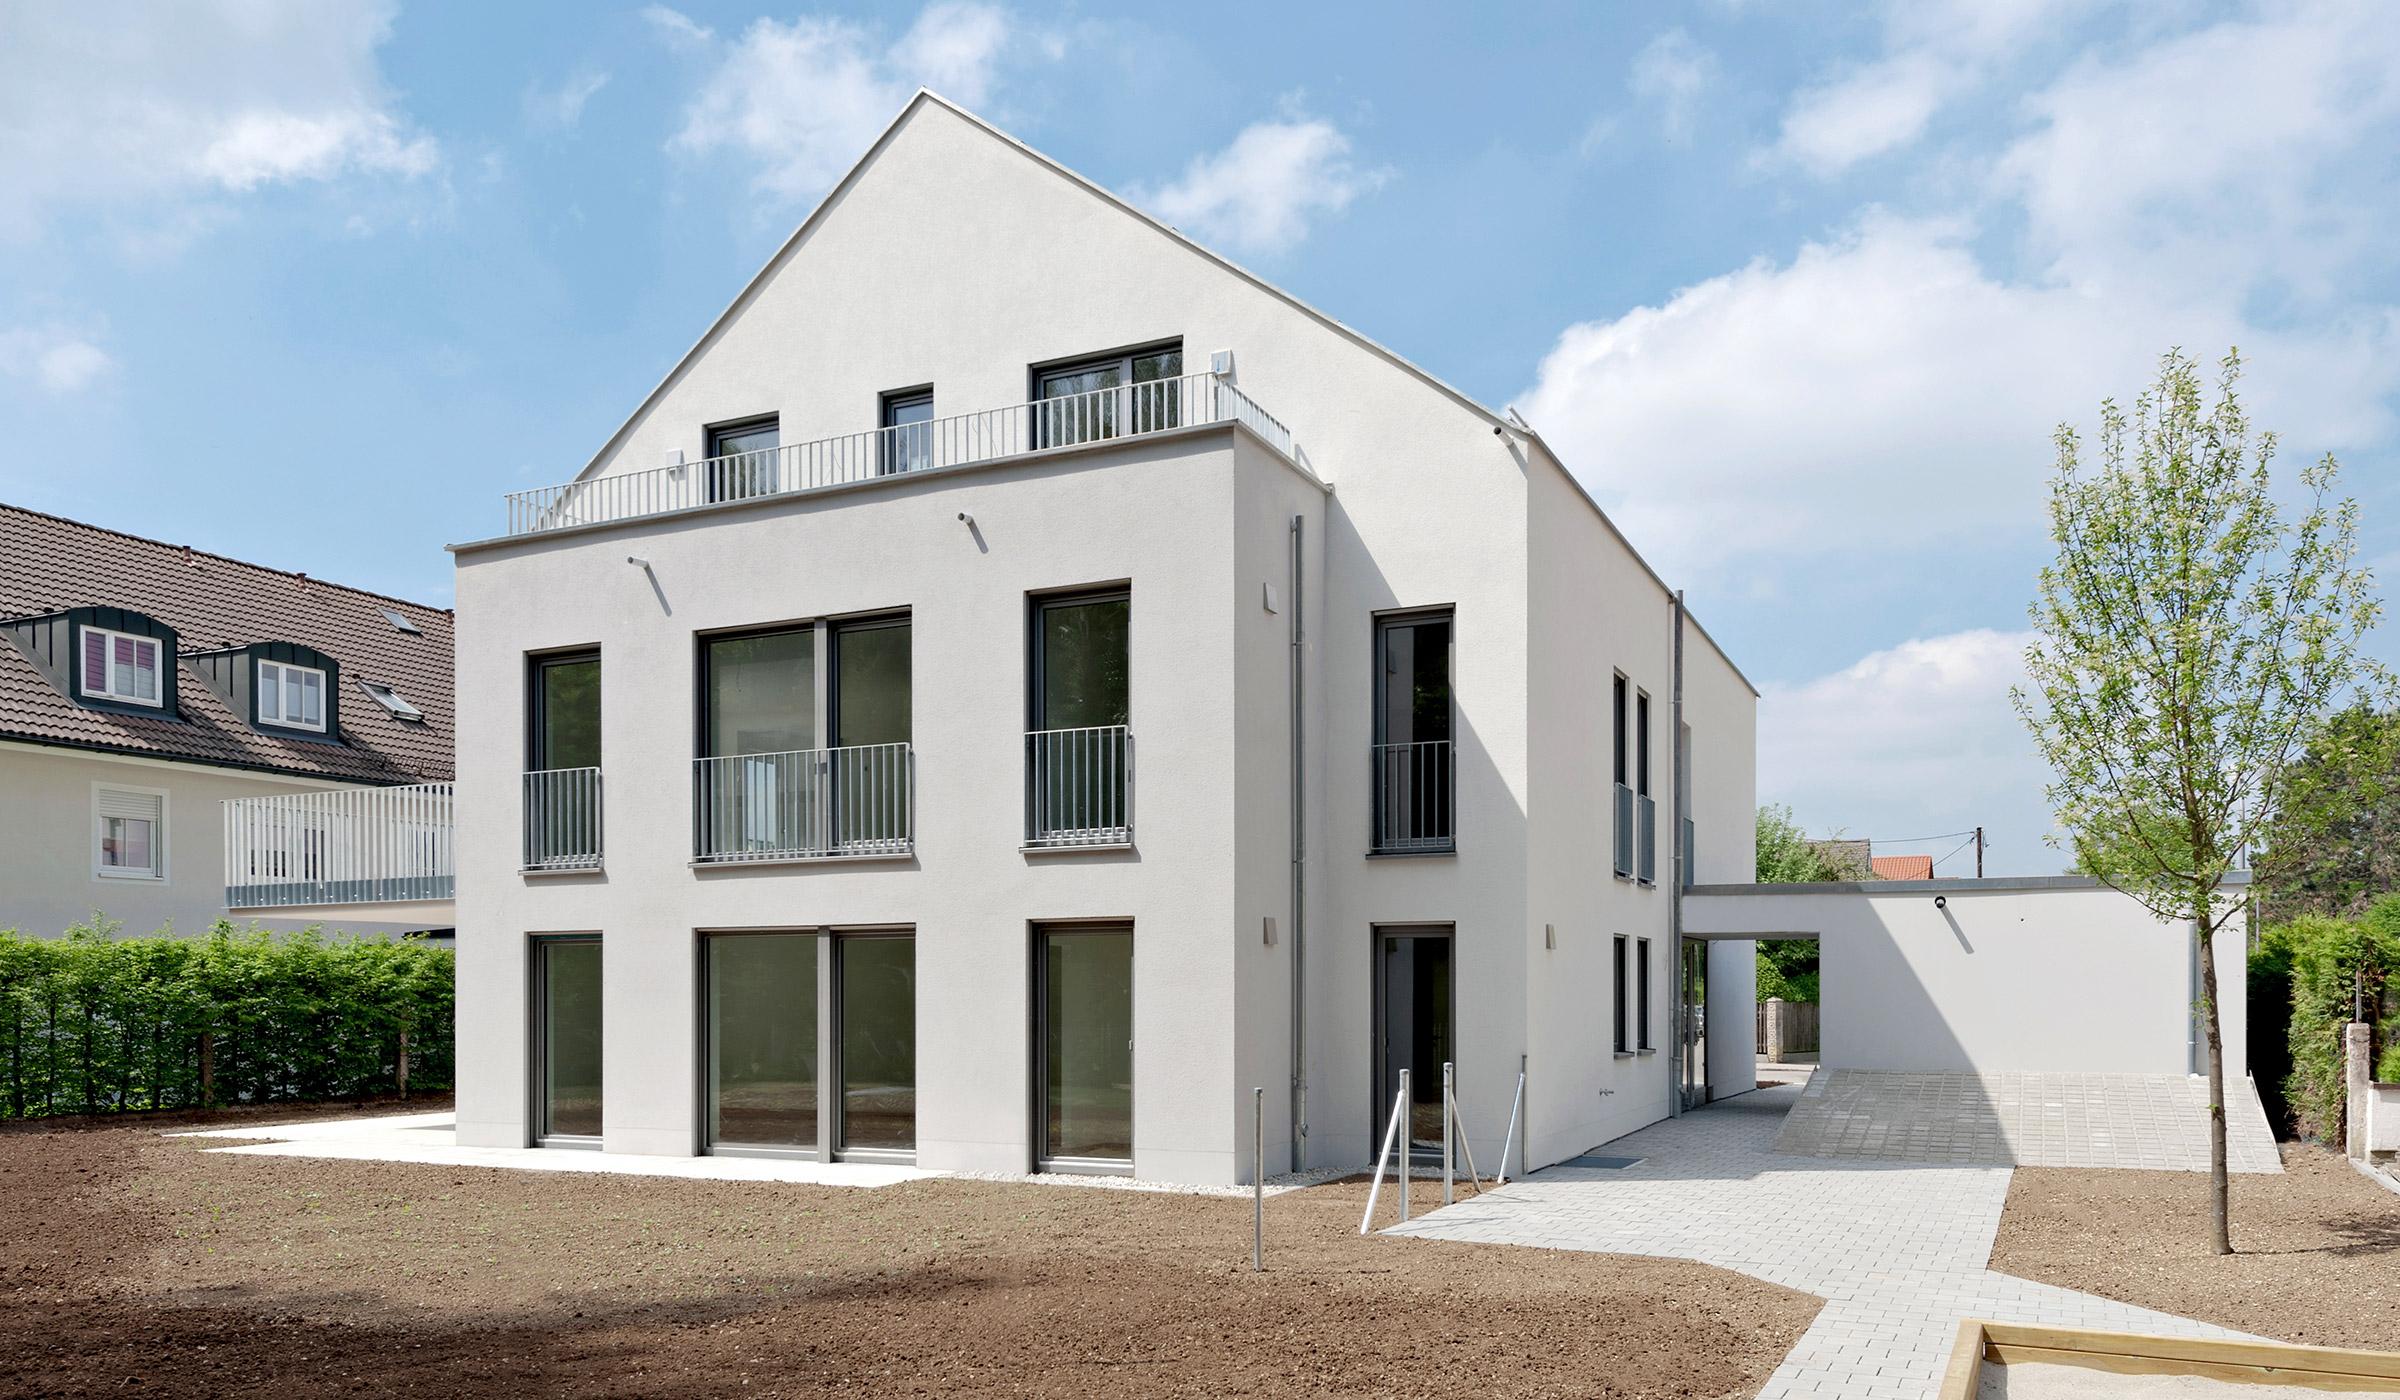 3BAU-Referenz-Heimdall-Neubau-Mehrfamilienhaus-Waldperlach-1